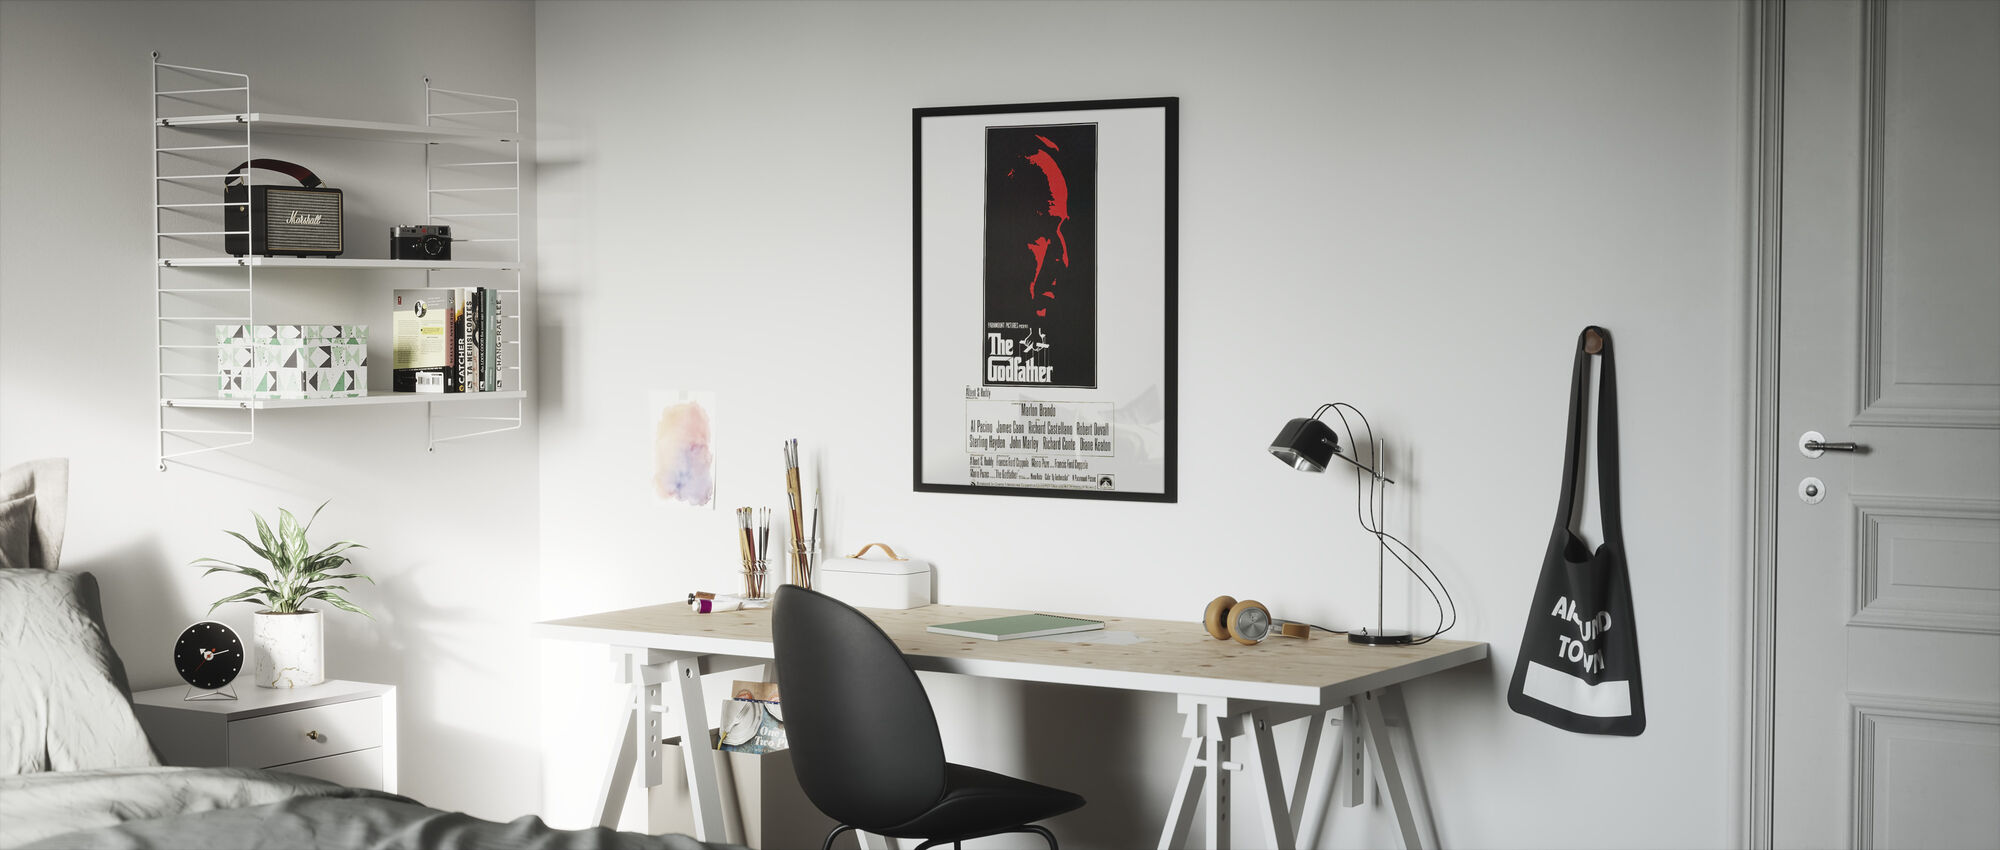 Film affisch Gudfadern - Inramad tavla - Barnrum